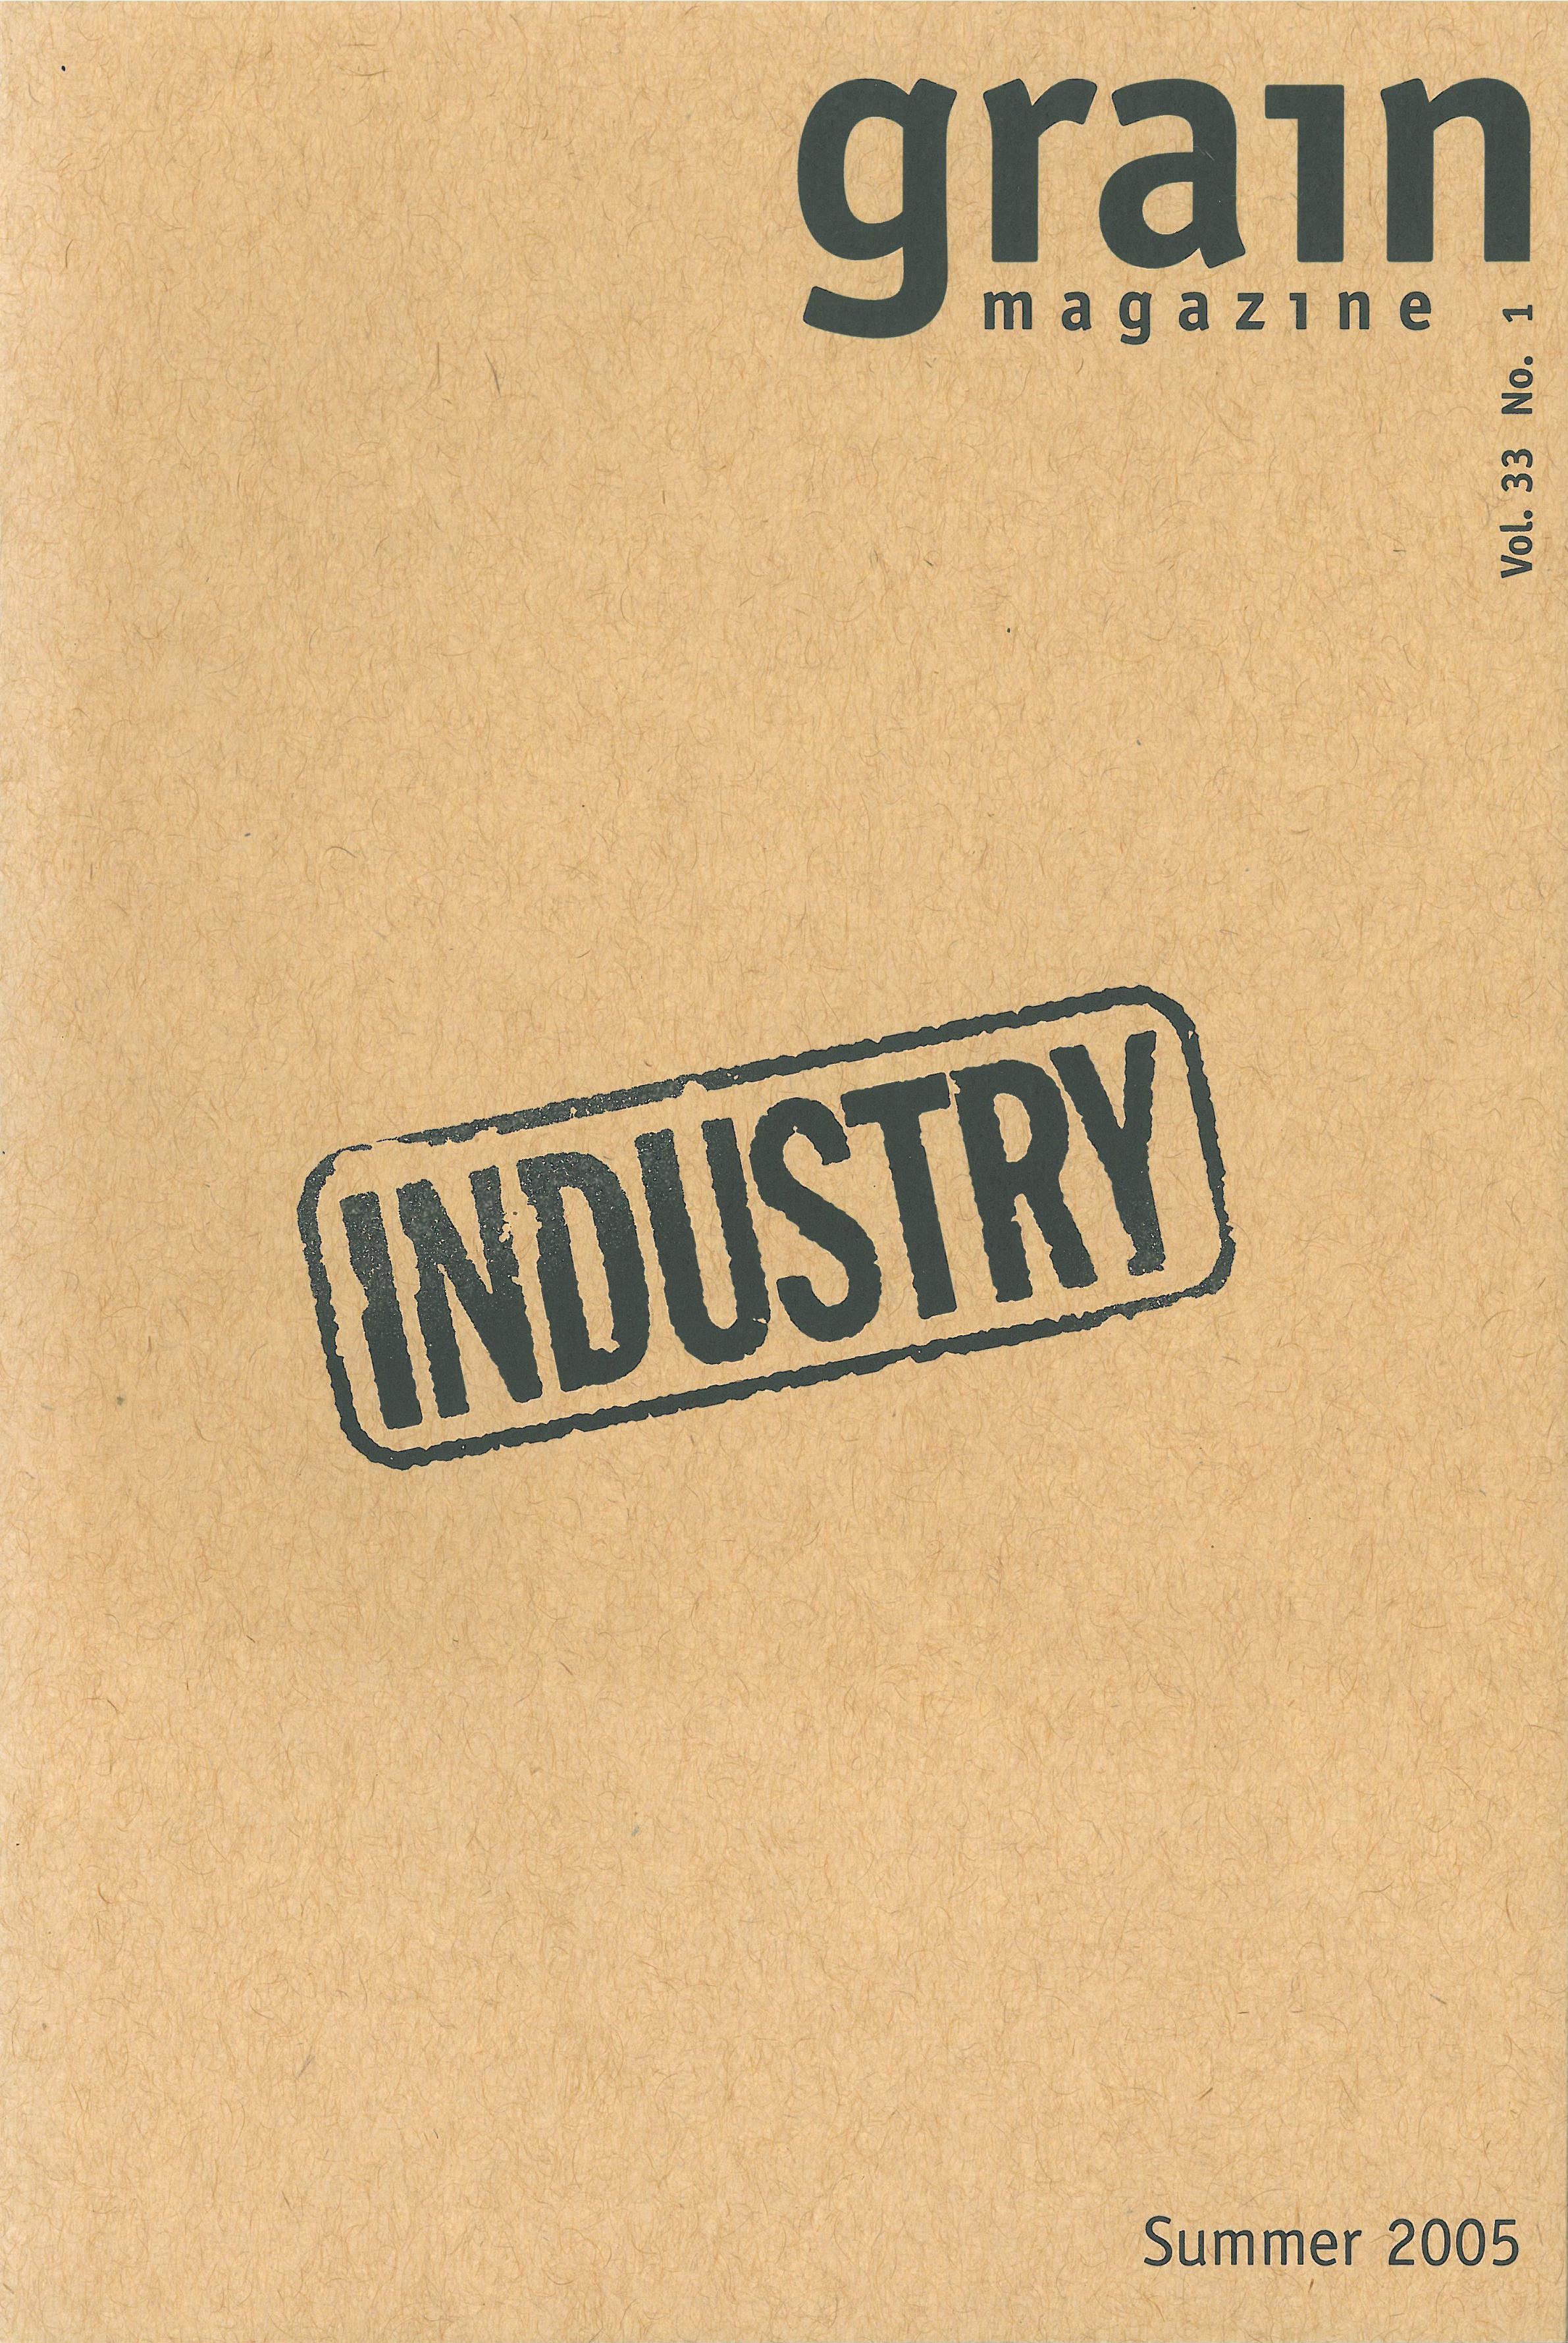 33.1 Summer 2005, Industry (sleeve)